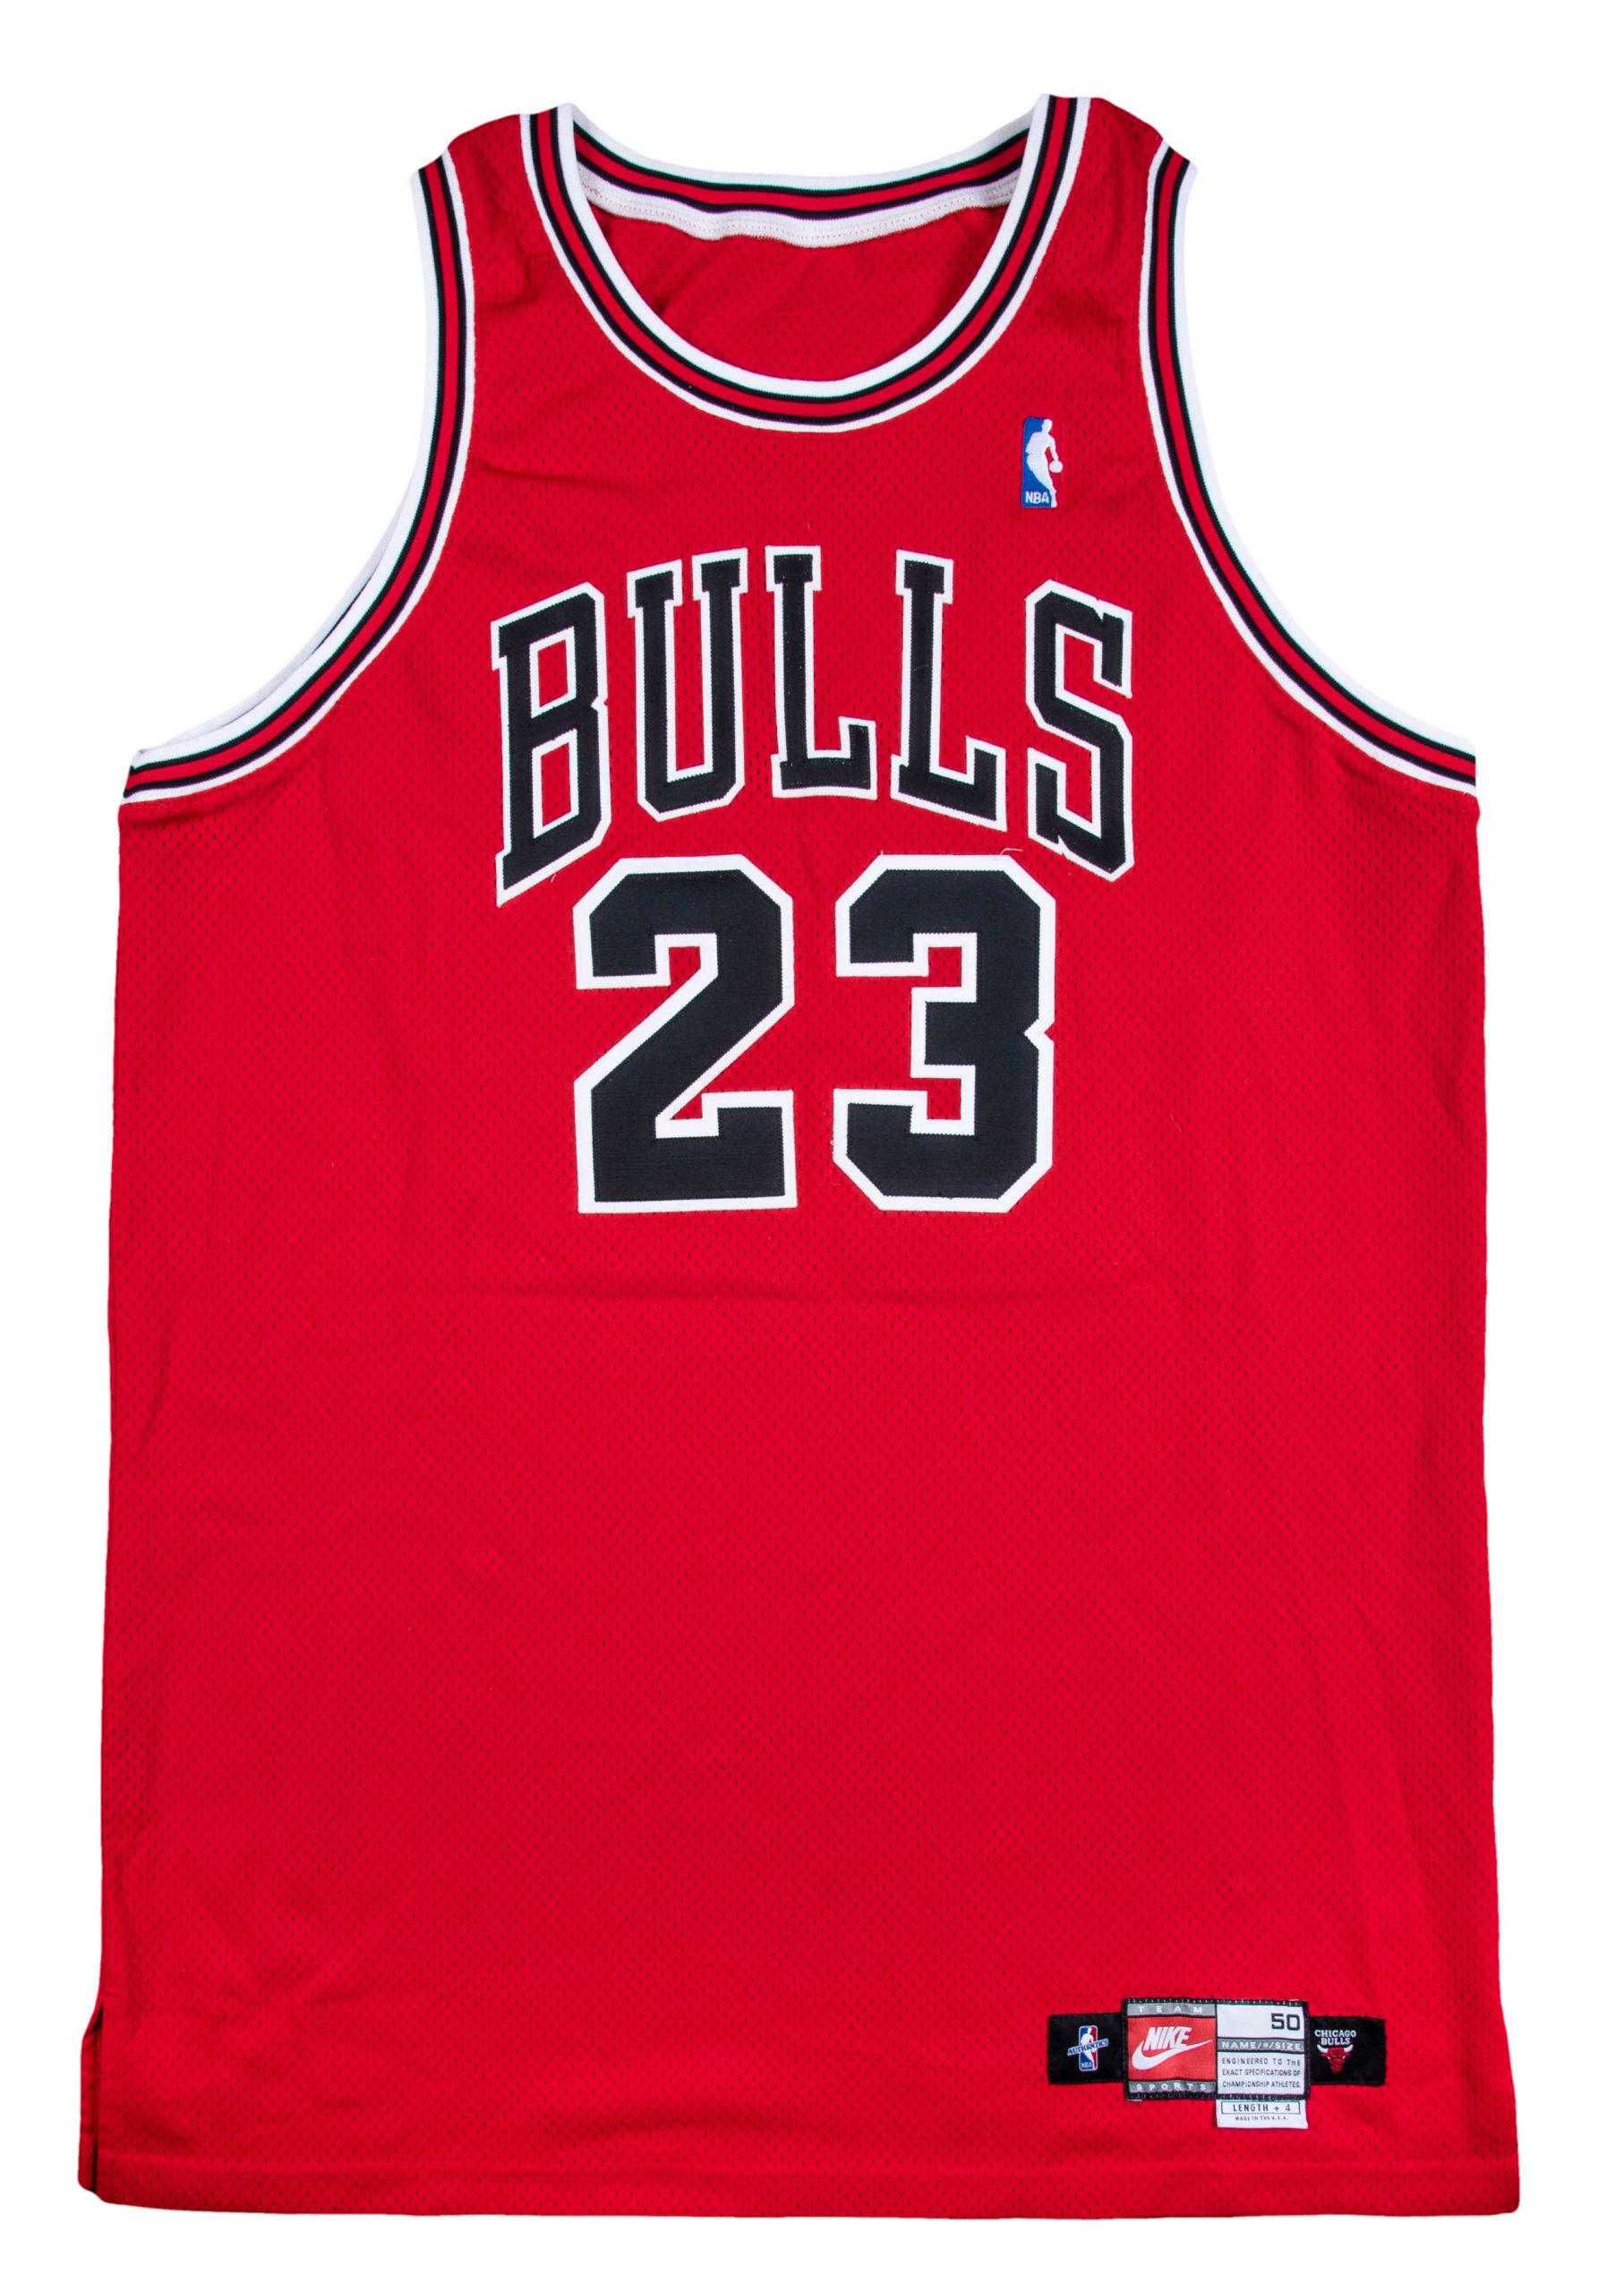 1998 Eastern Finals Michael Jordan Jersey Could Set Record